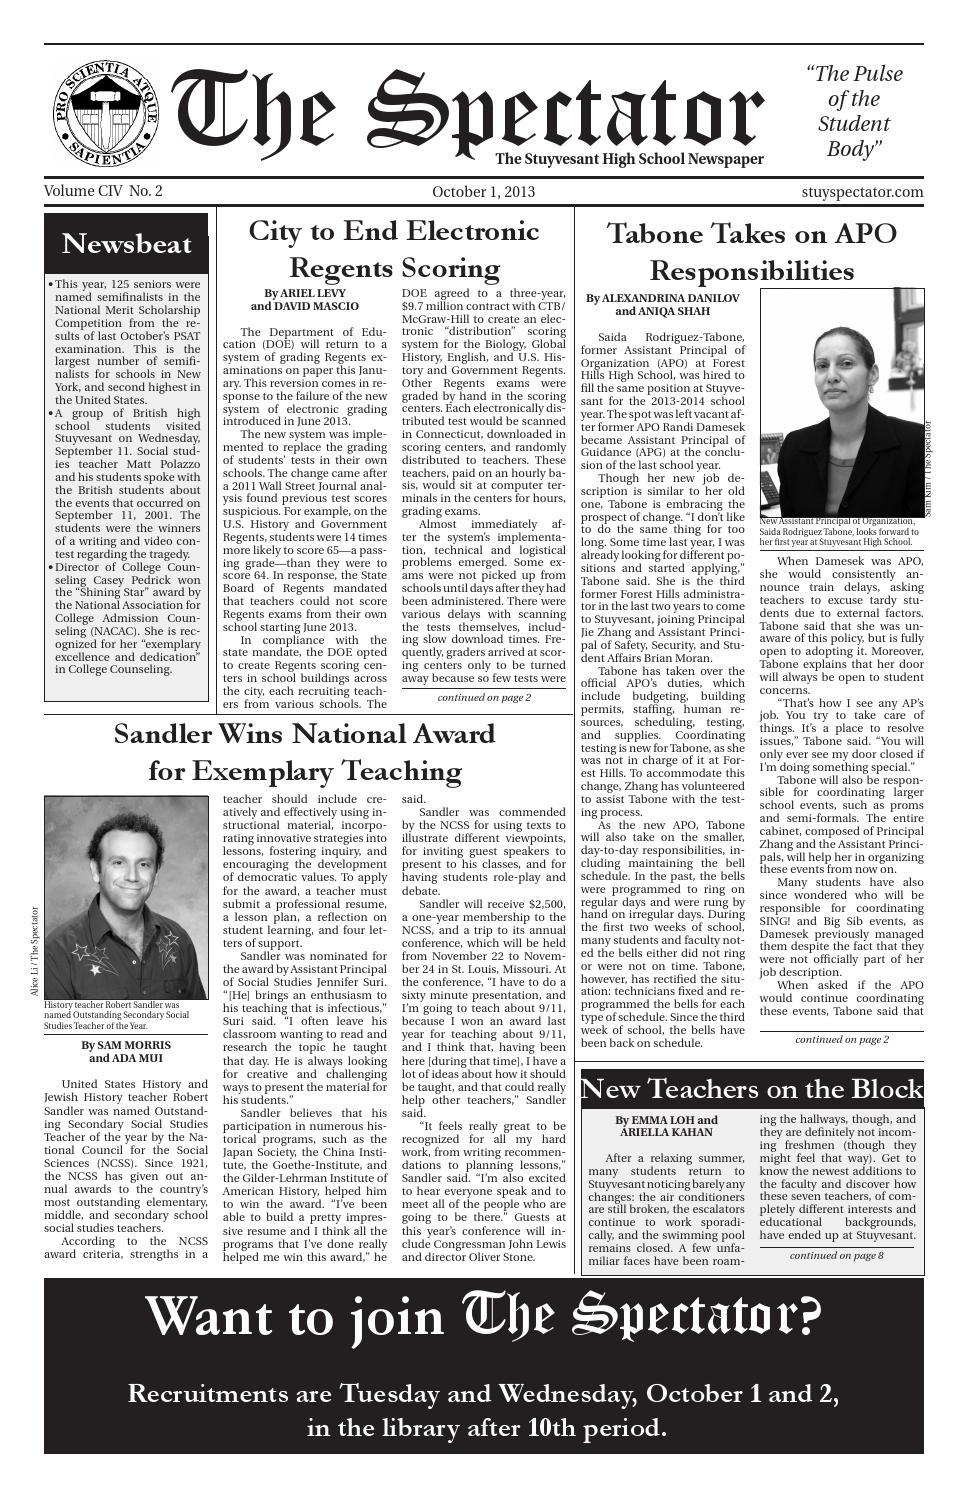 Volume 104, Issue 2 by The Stuyvesant Spectator issuu